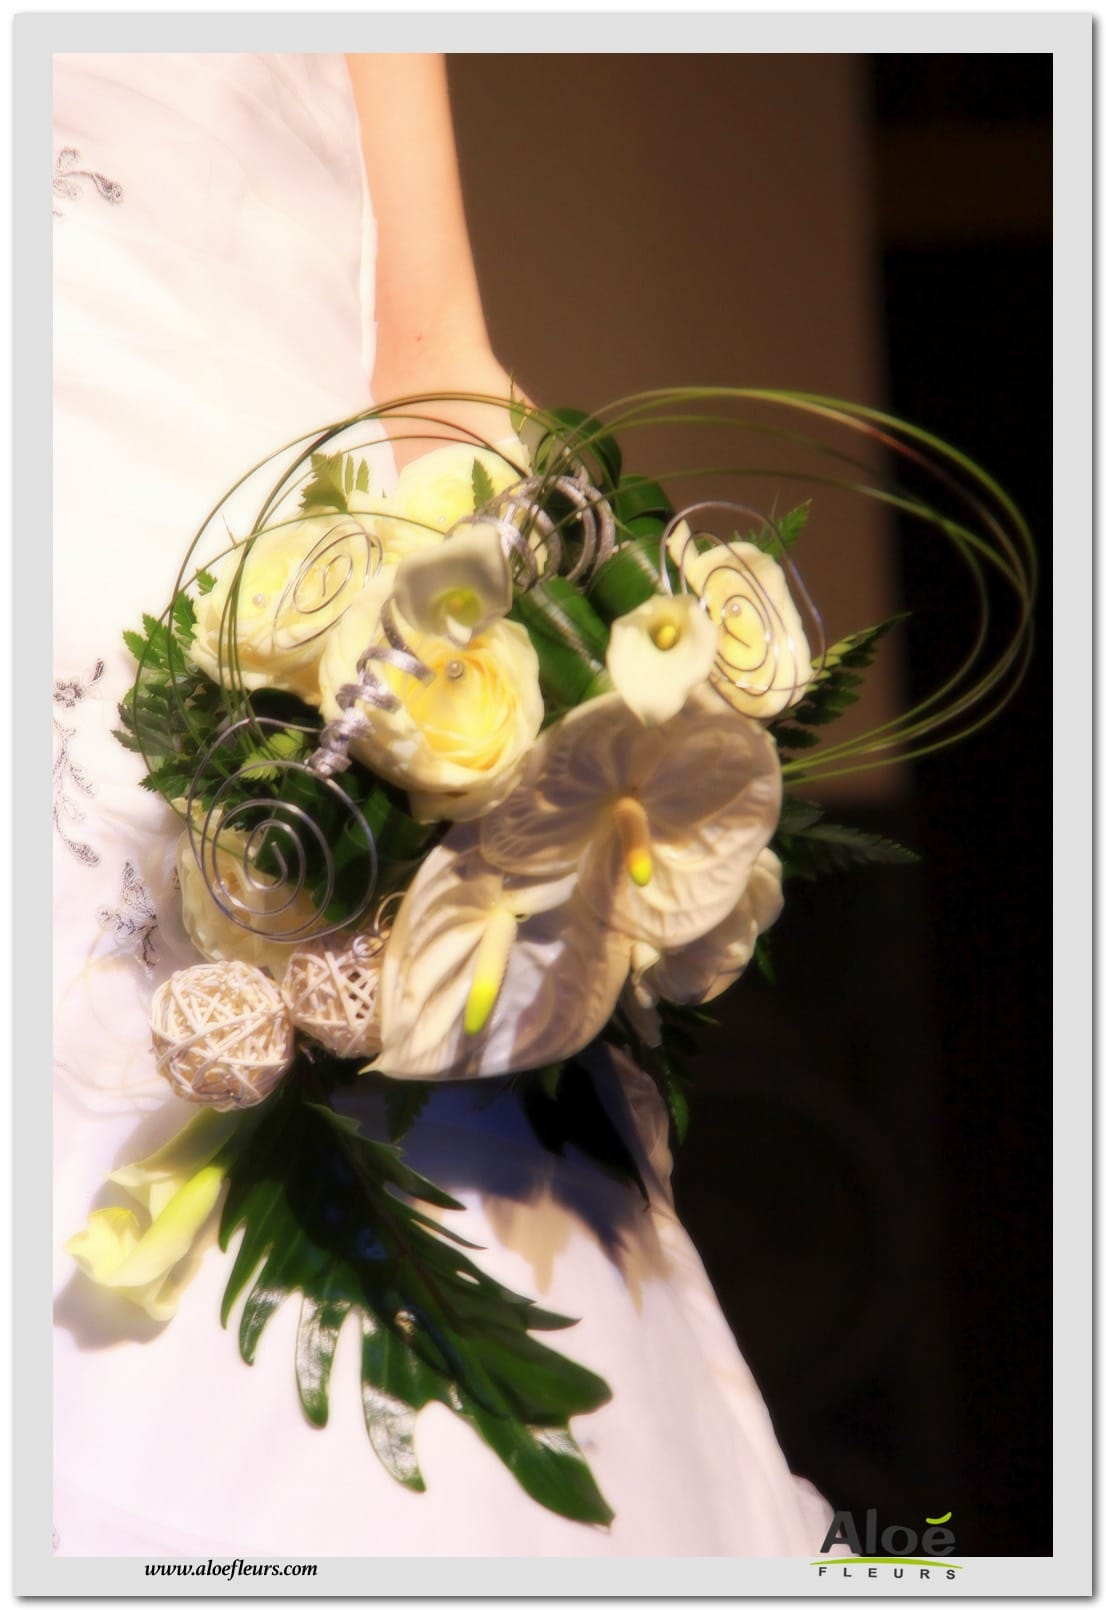 bouquets de mari e accueil aloe fleurs. Black Bedroom Furniture Sets. Home Design Ideas